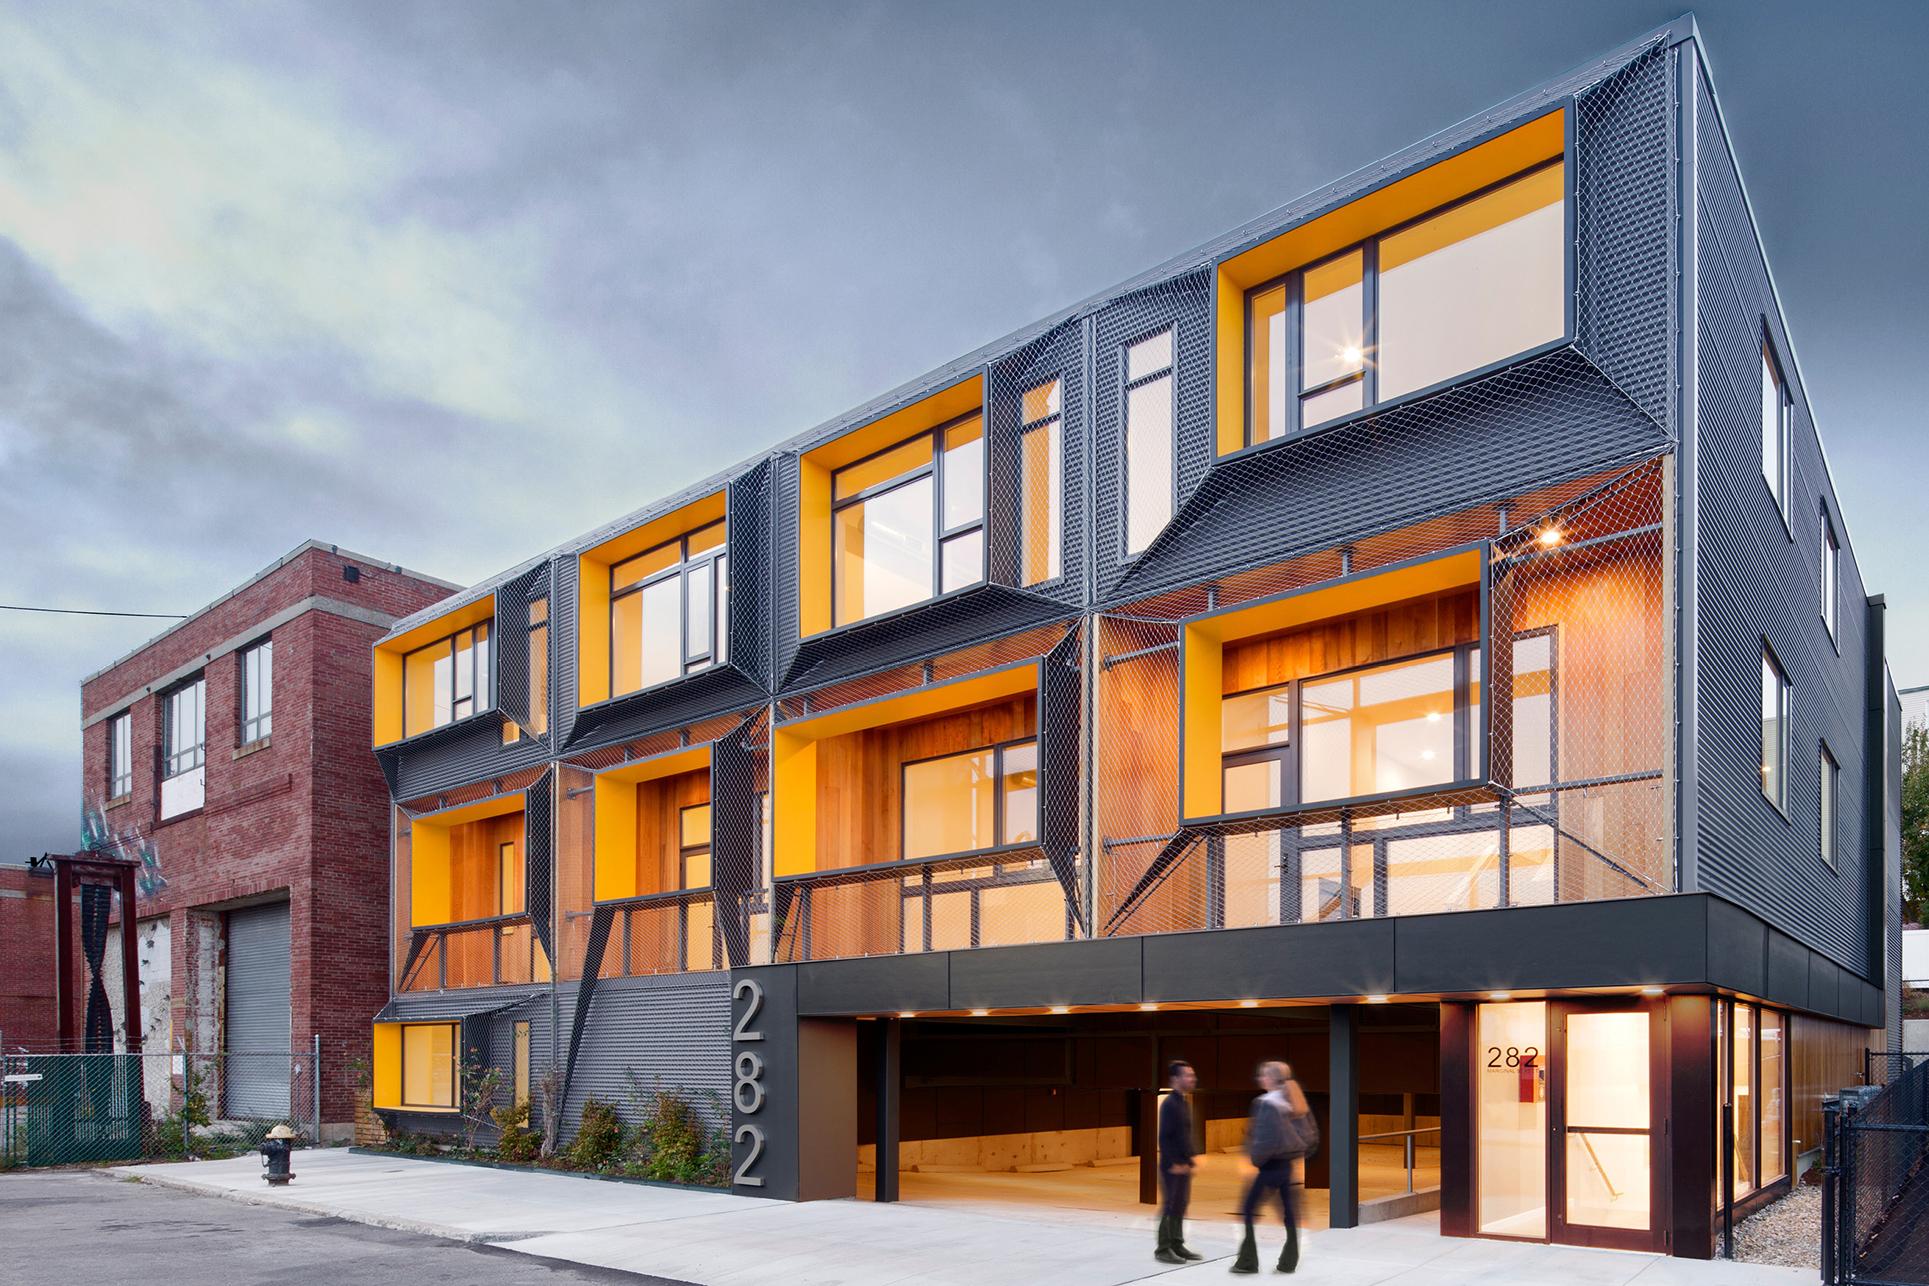 marginal street lofts residential architect merge architects east boston massachusetts. Black Bedroom Furniture Sets. Home Design Ideas